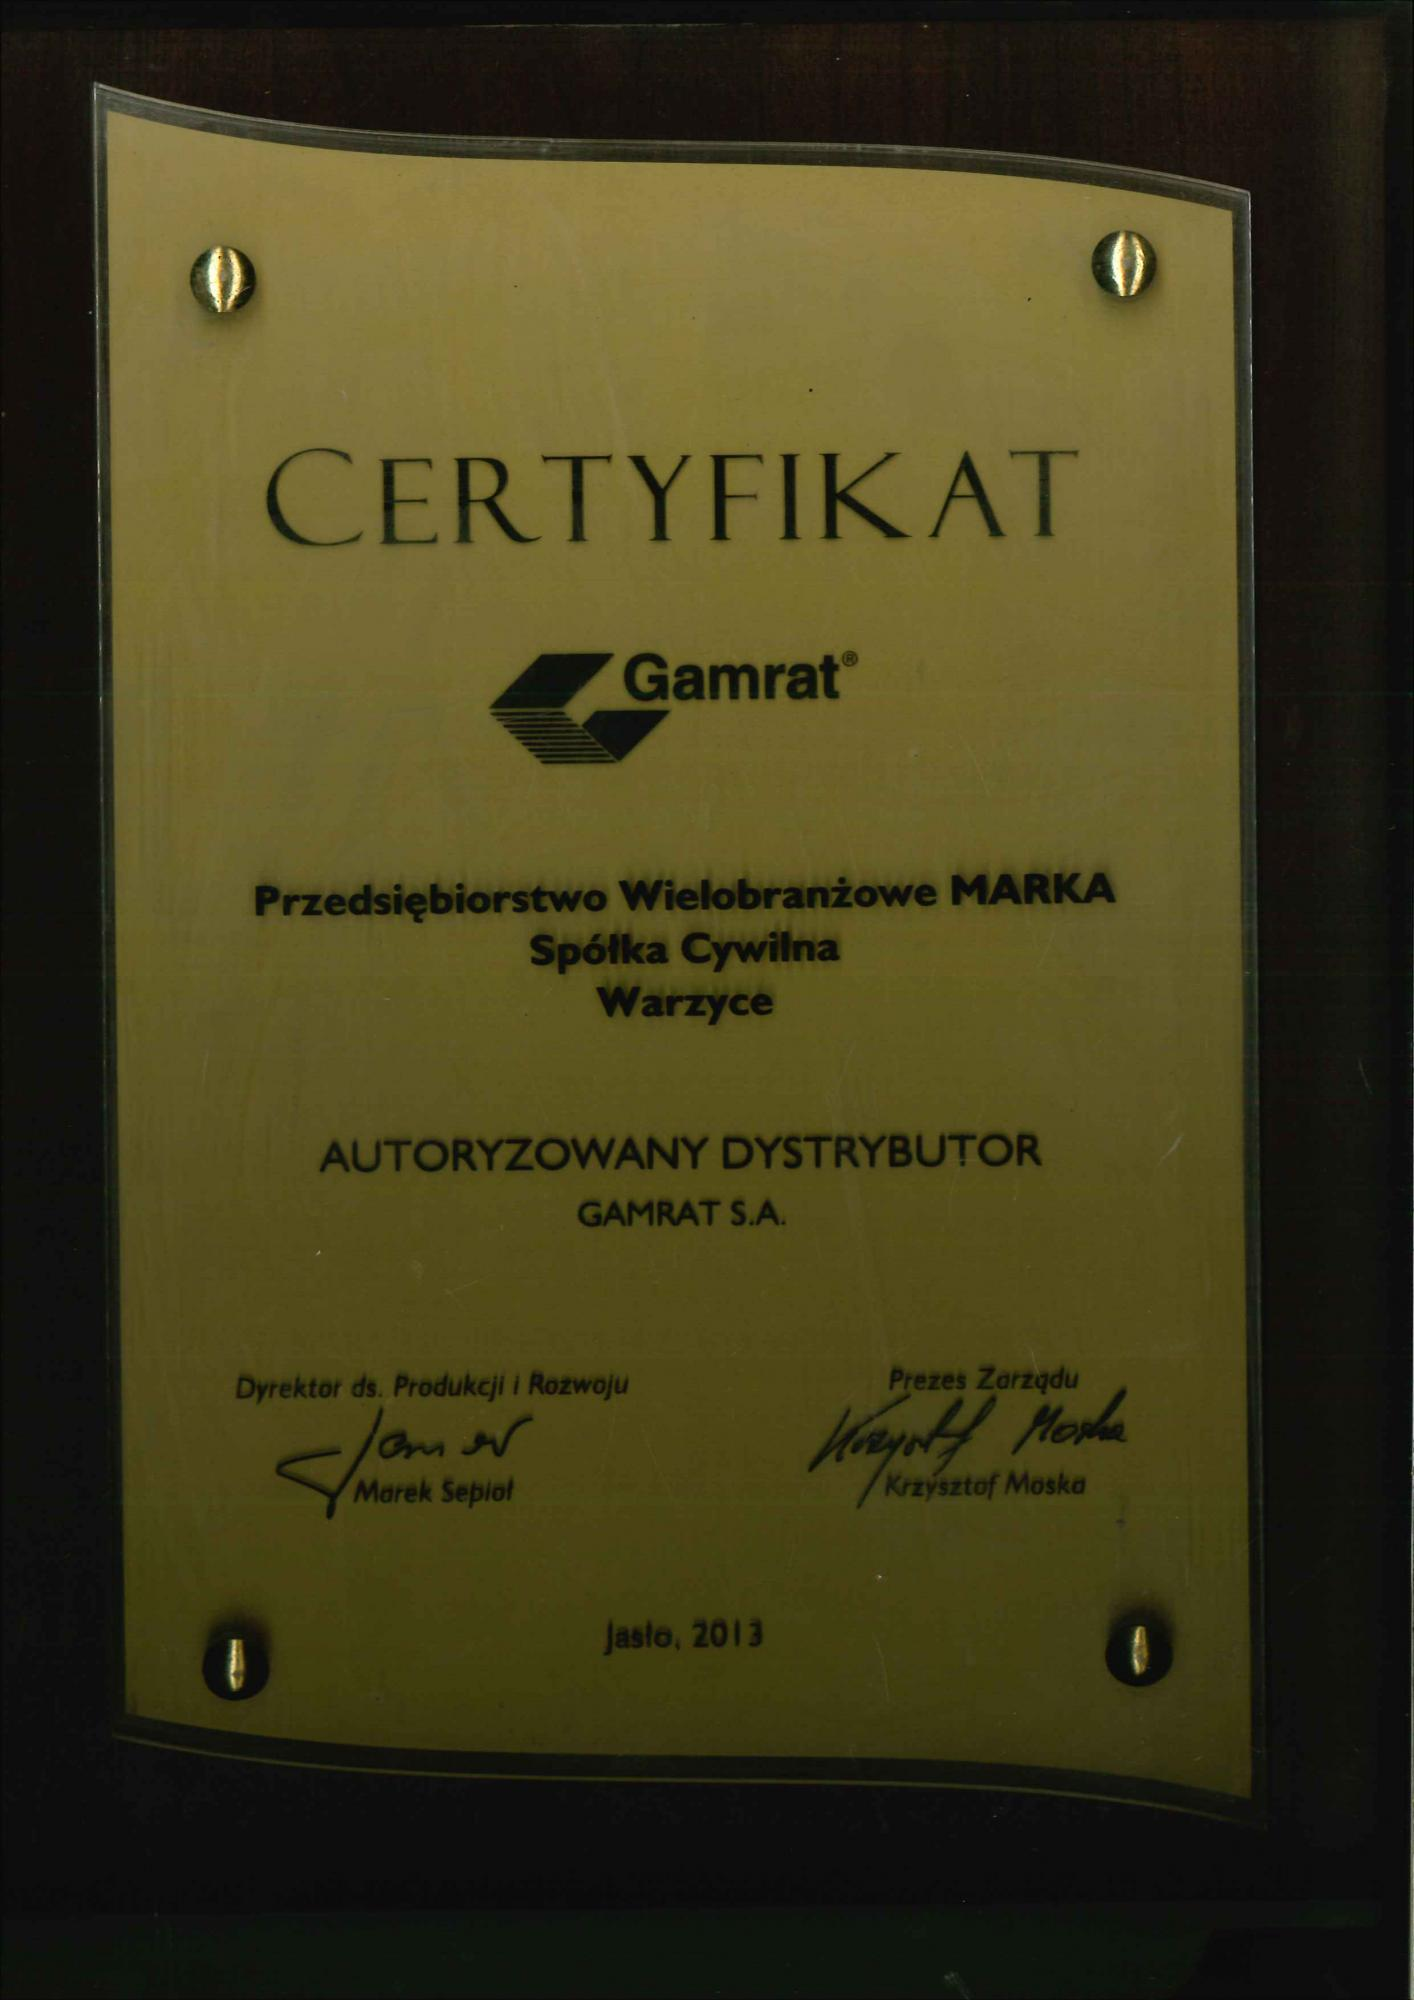 Certyfikat gamrat 2013